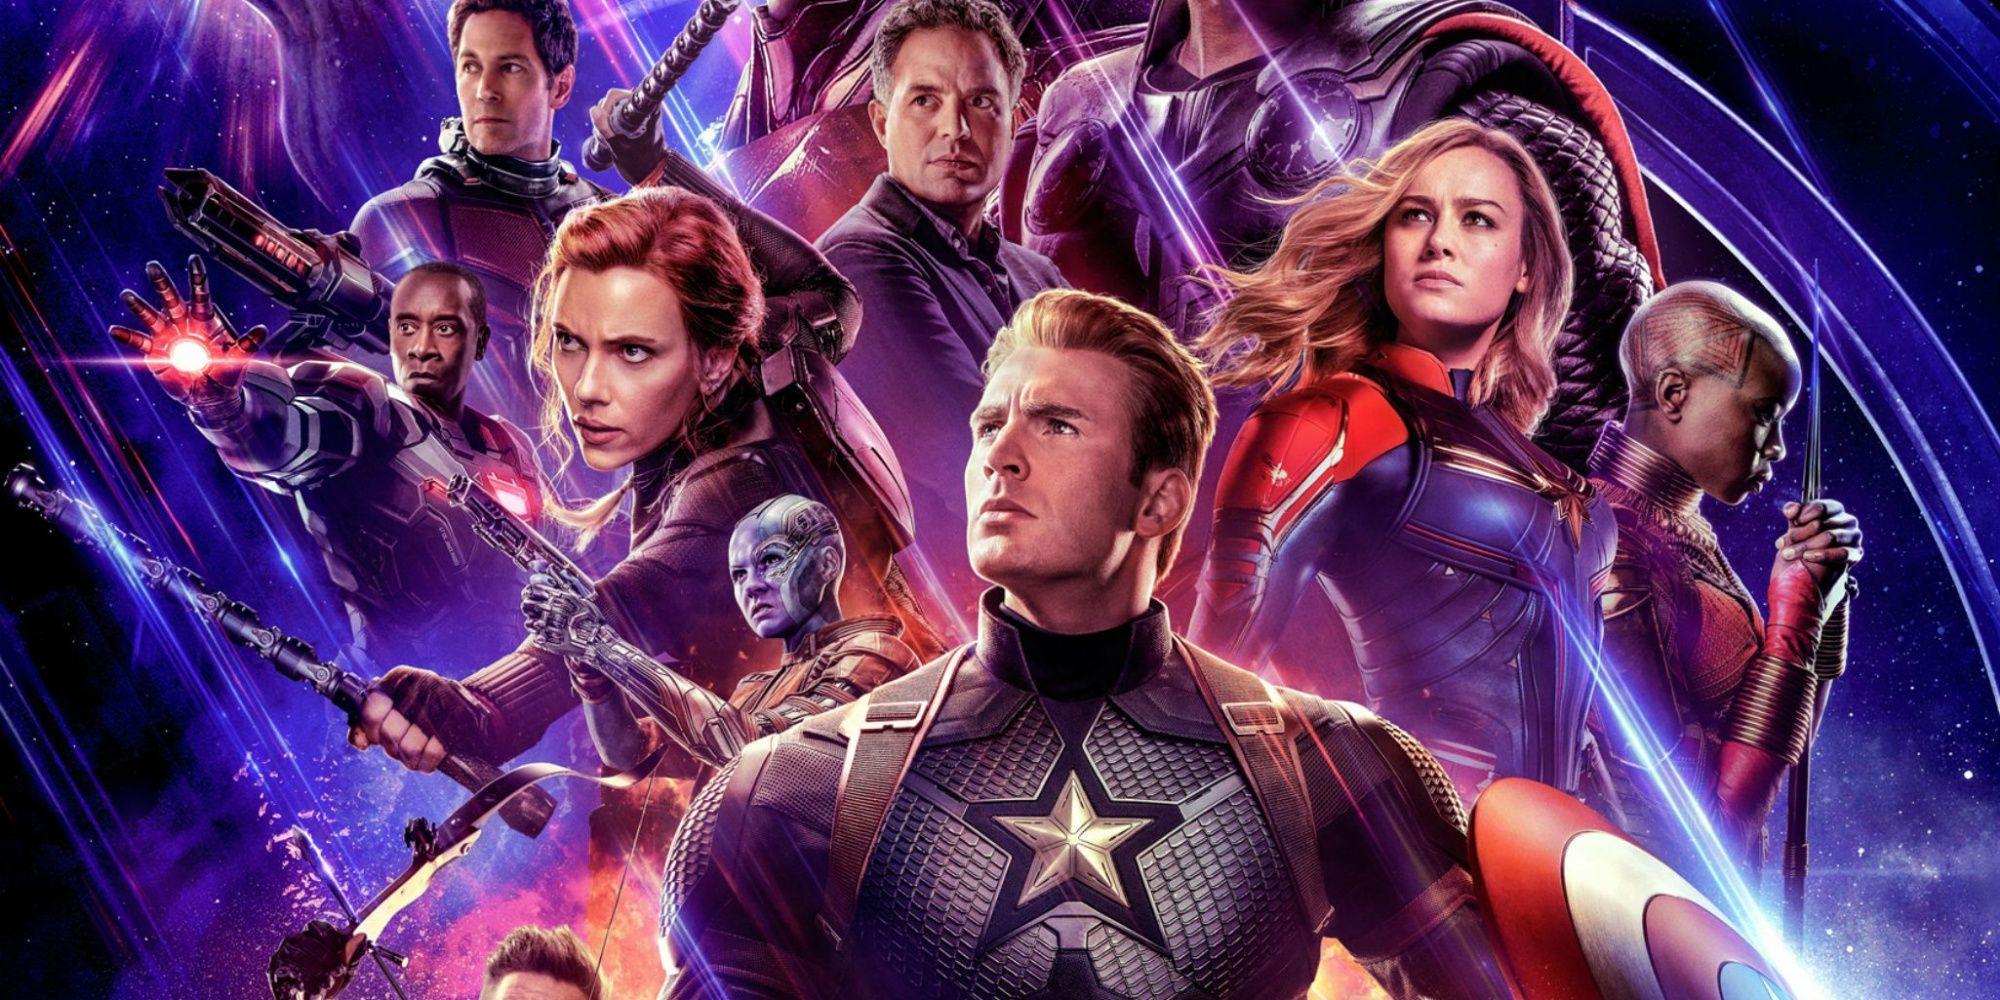 Avengers: Endgame Key Art Assembles the Entire Team | CBR